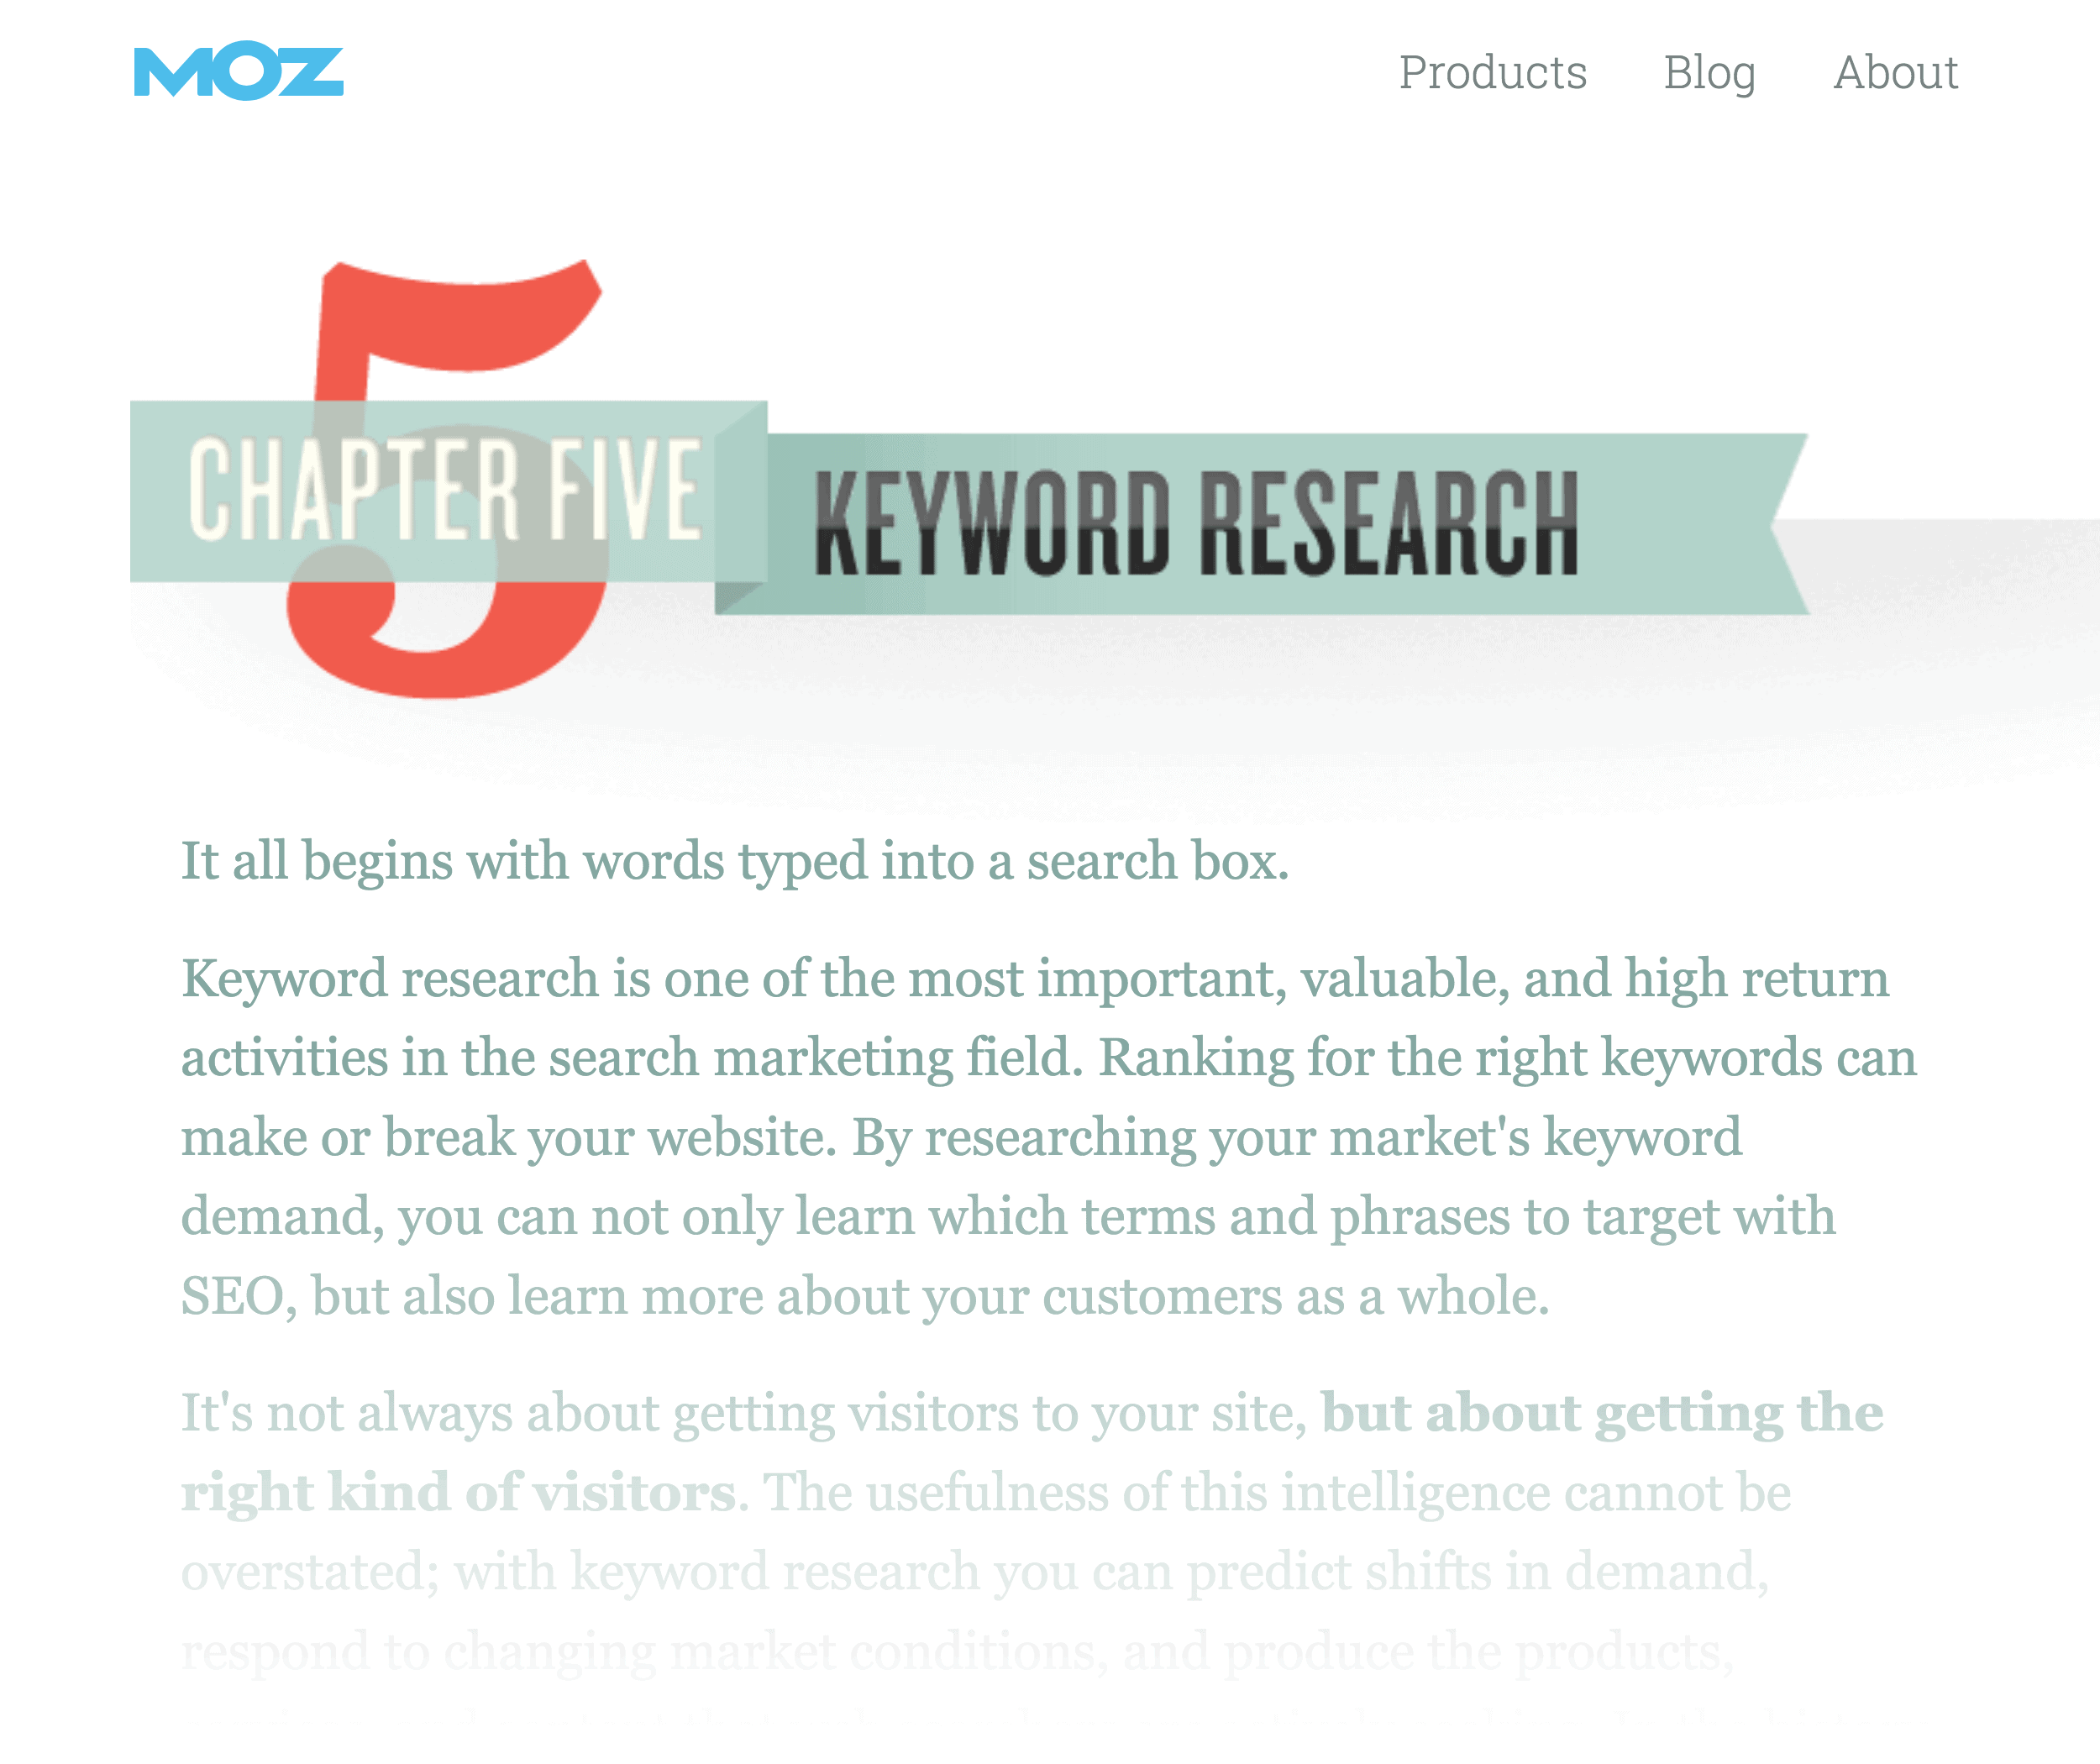 Moz – Keyword Research